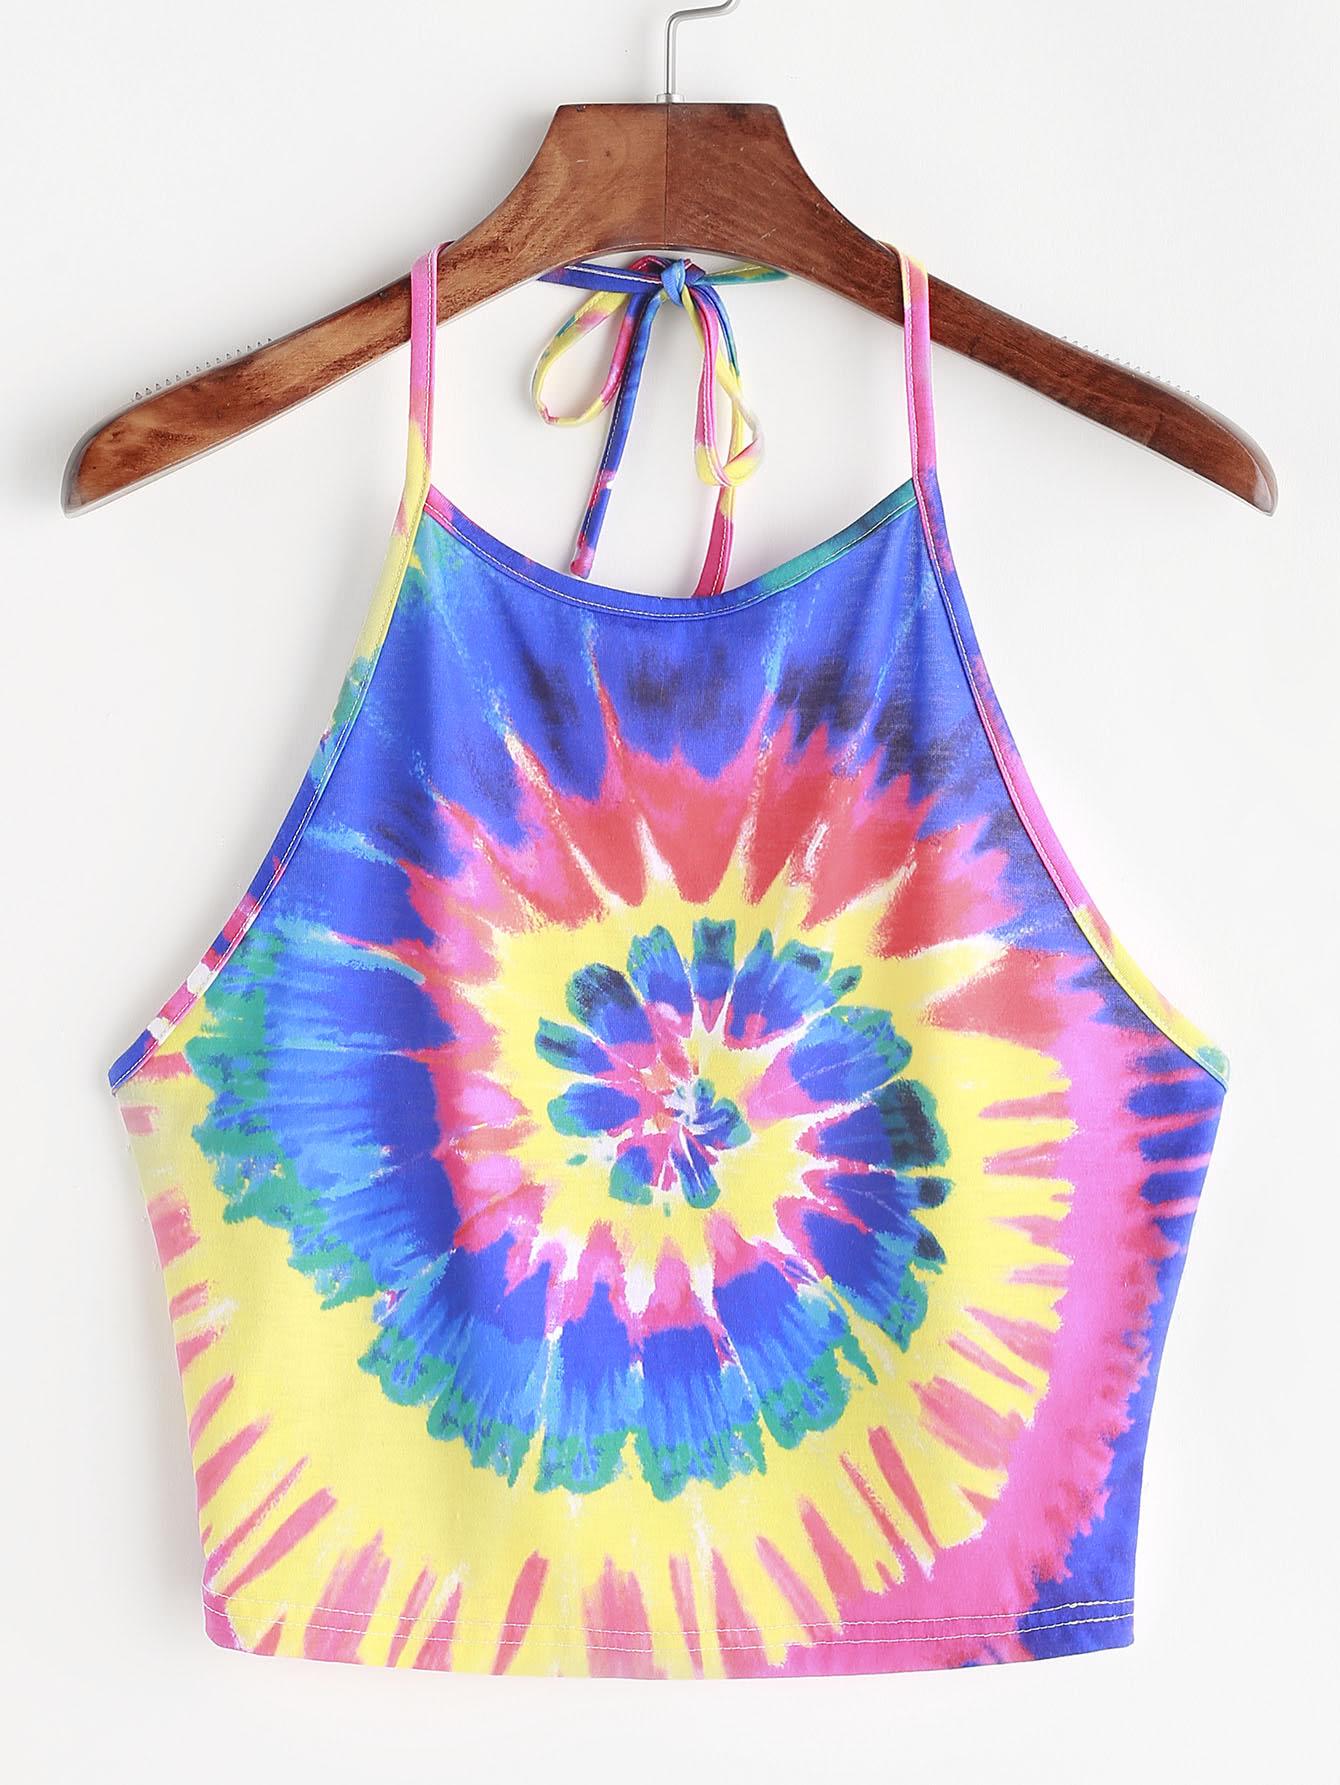 Spiral Tie Dye Print Tie Halter Topfor Womenromwe